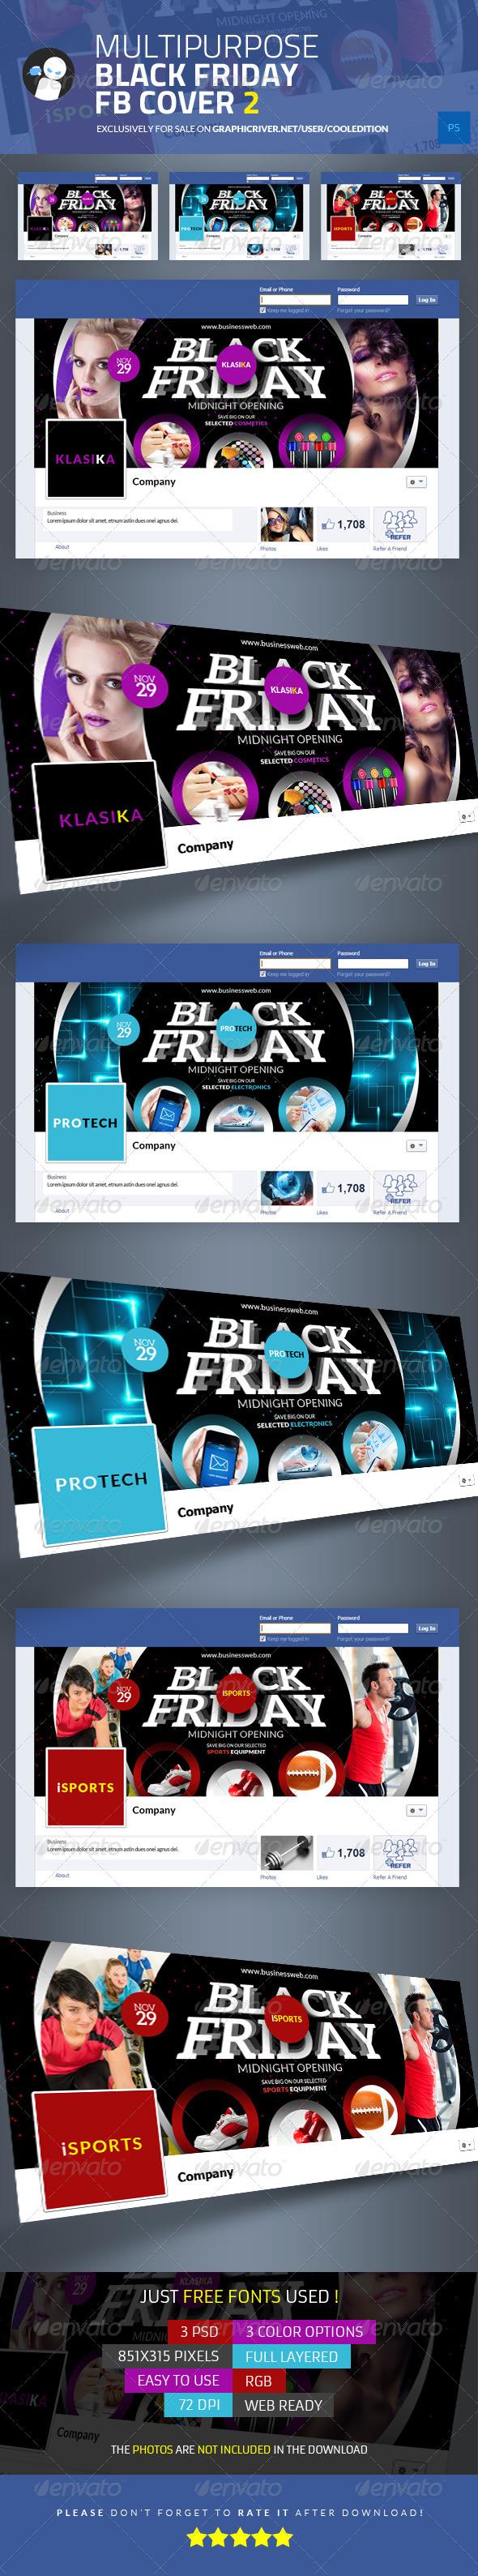 Multipurpose Black Friday Facebook Cover 2 - Facebook Timeline Covers Social Media